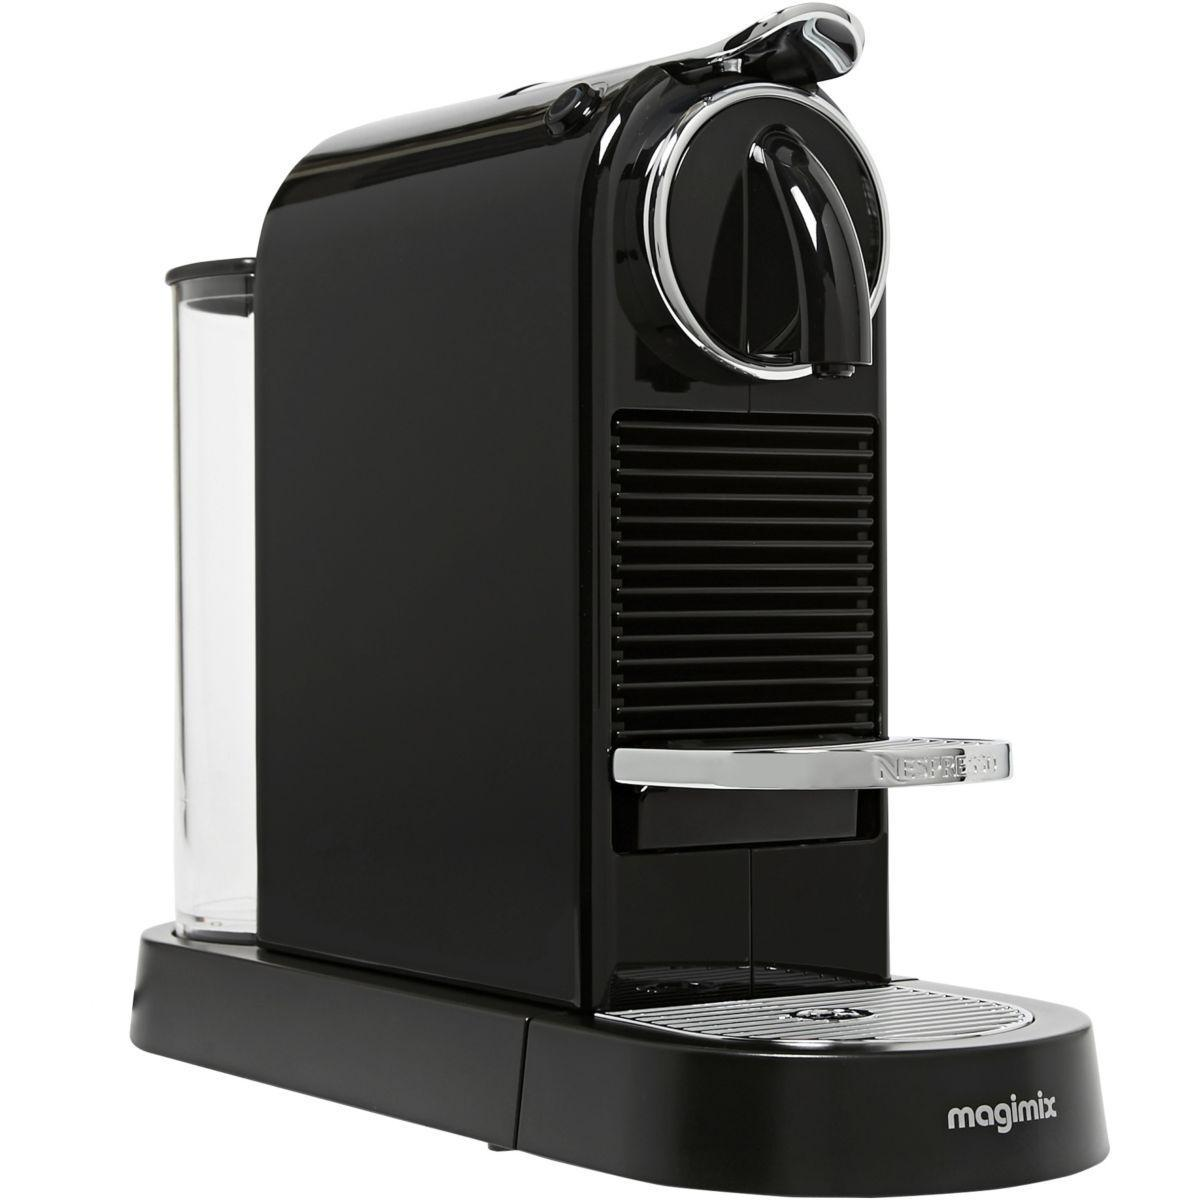 Machine à capsules Nespresso MAGIMIX Citiz 11315 Noir